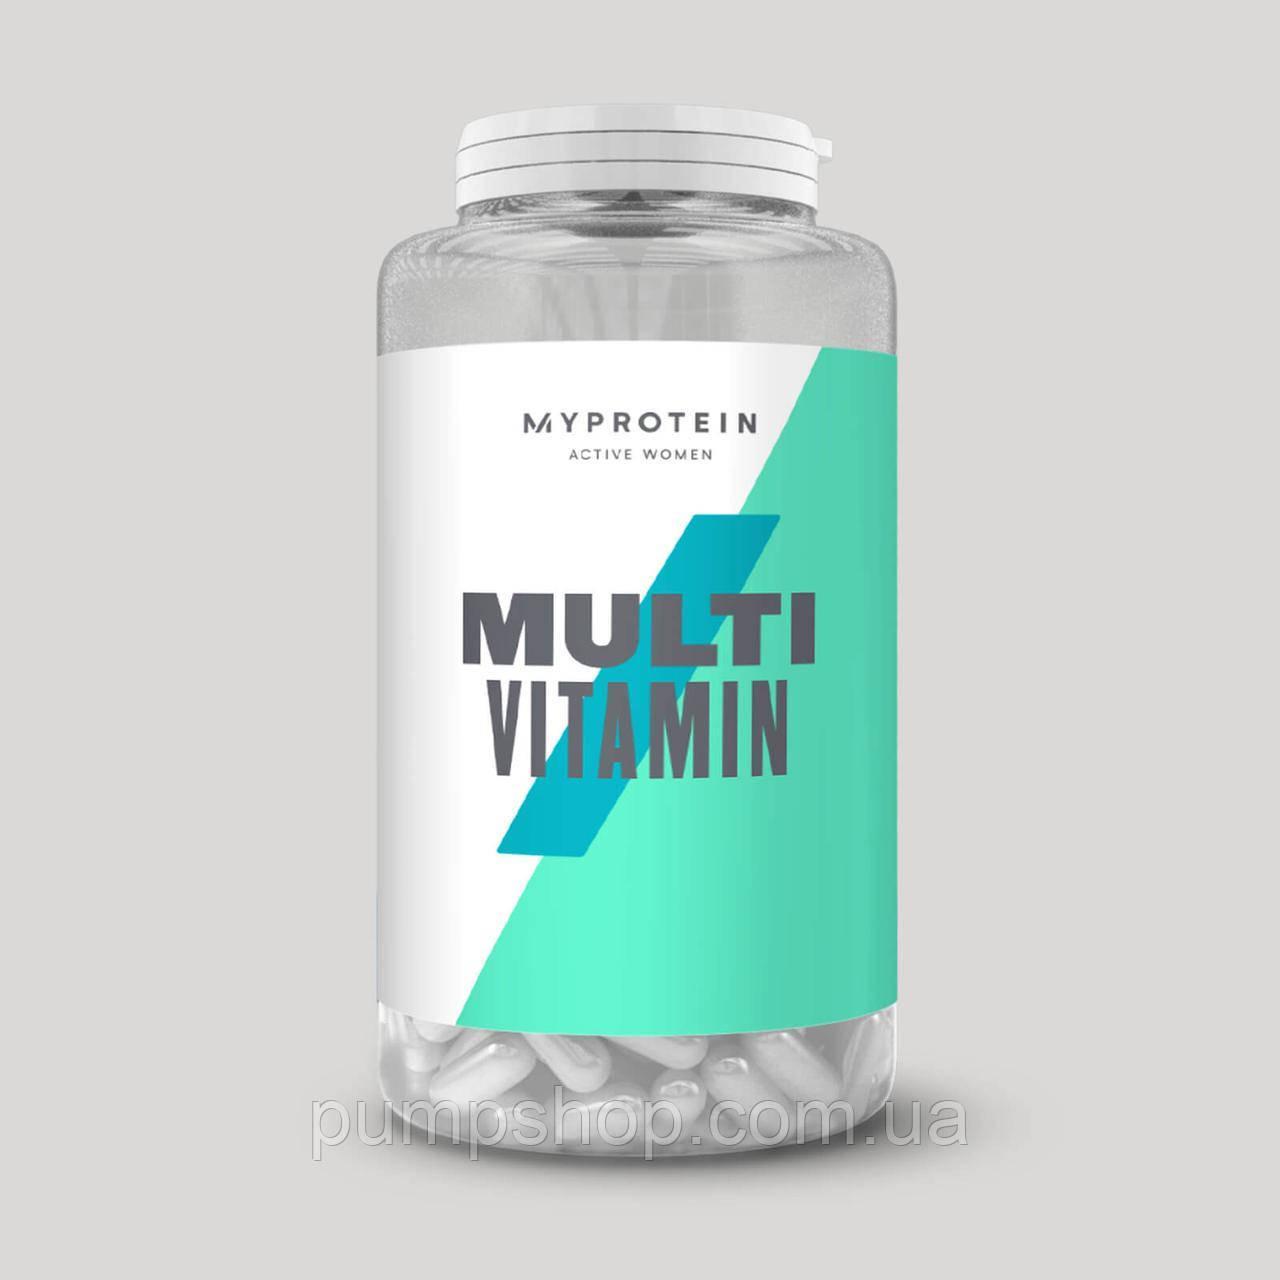 Вітаміни для жінок Myprotein Active Woman 120 капс.